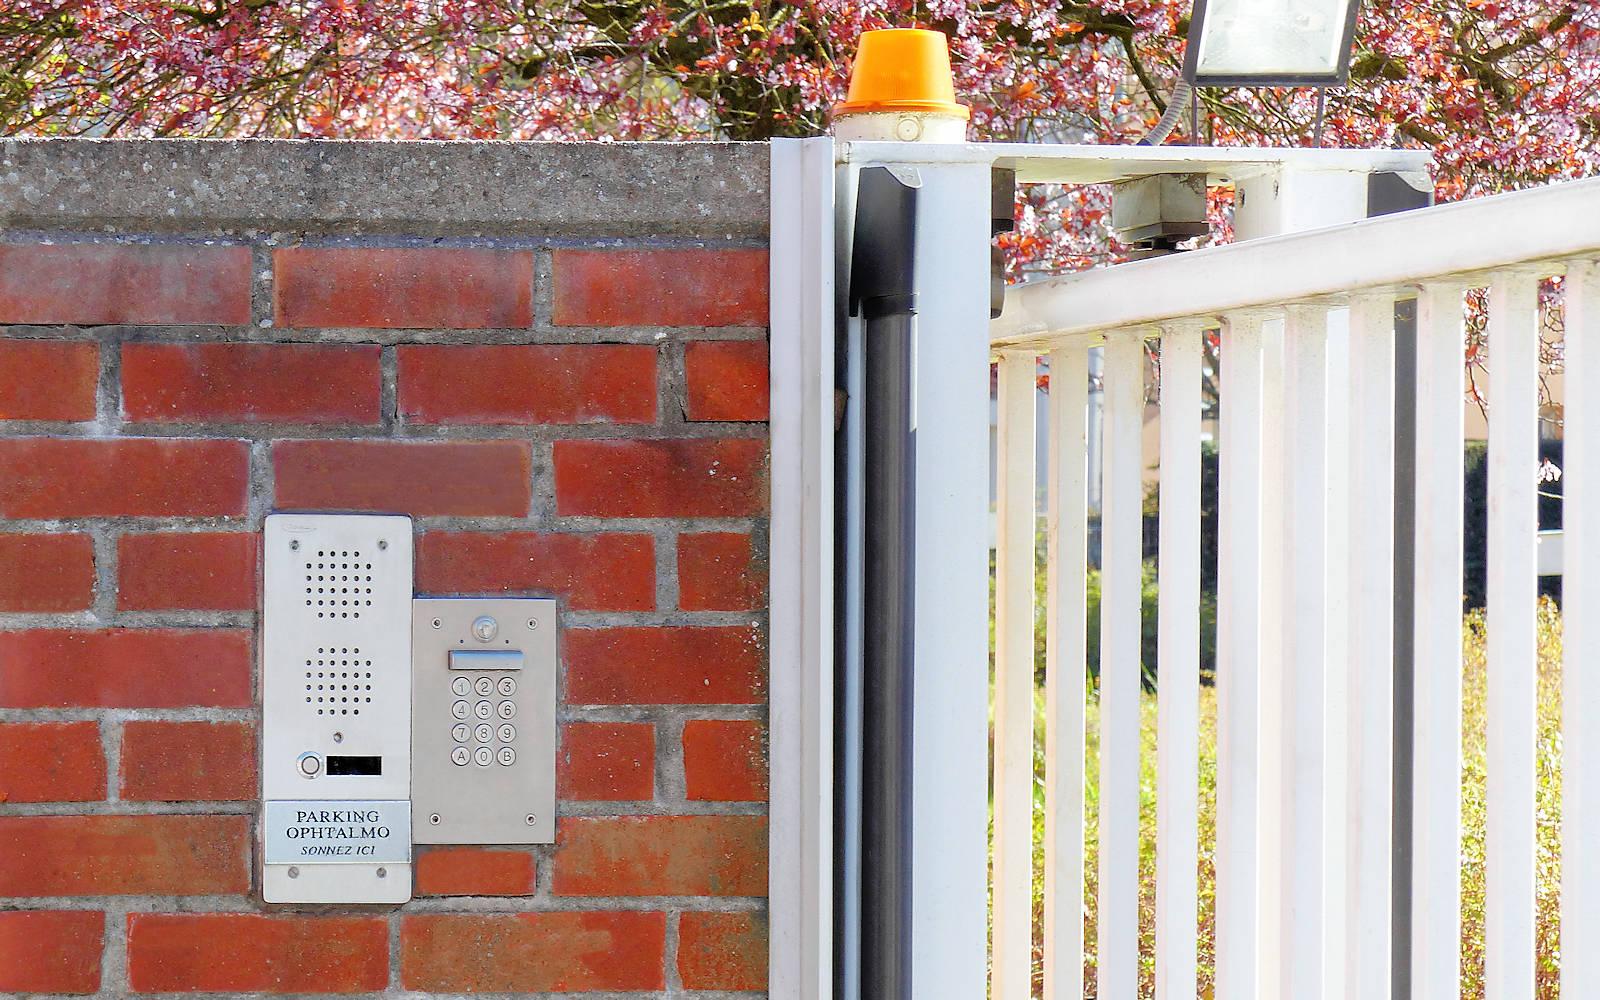 Ophtalmo Tourcoing - Interphone parking AOBEFFROI